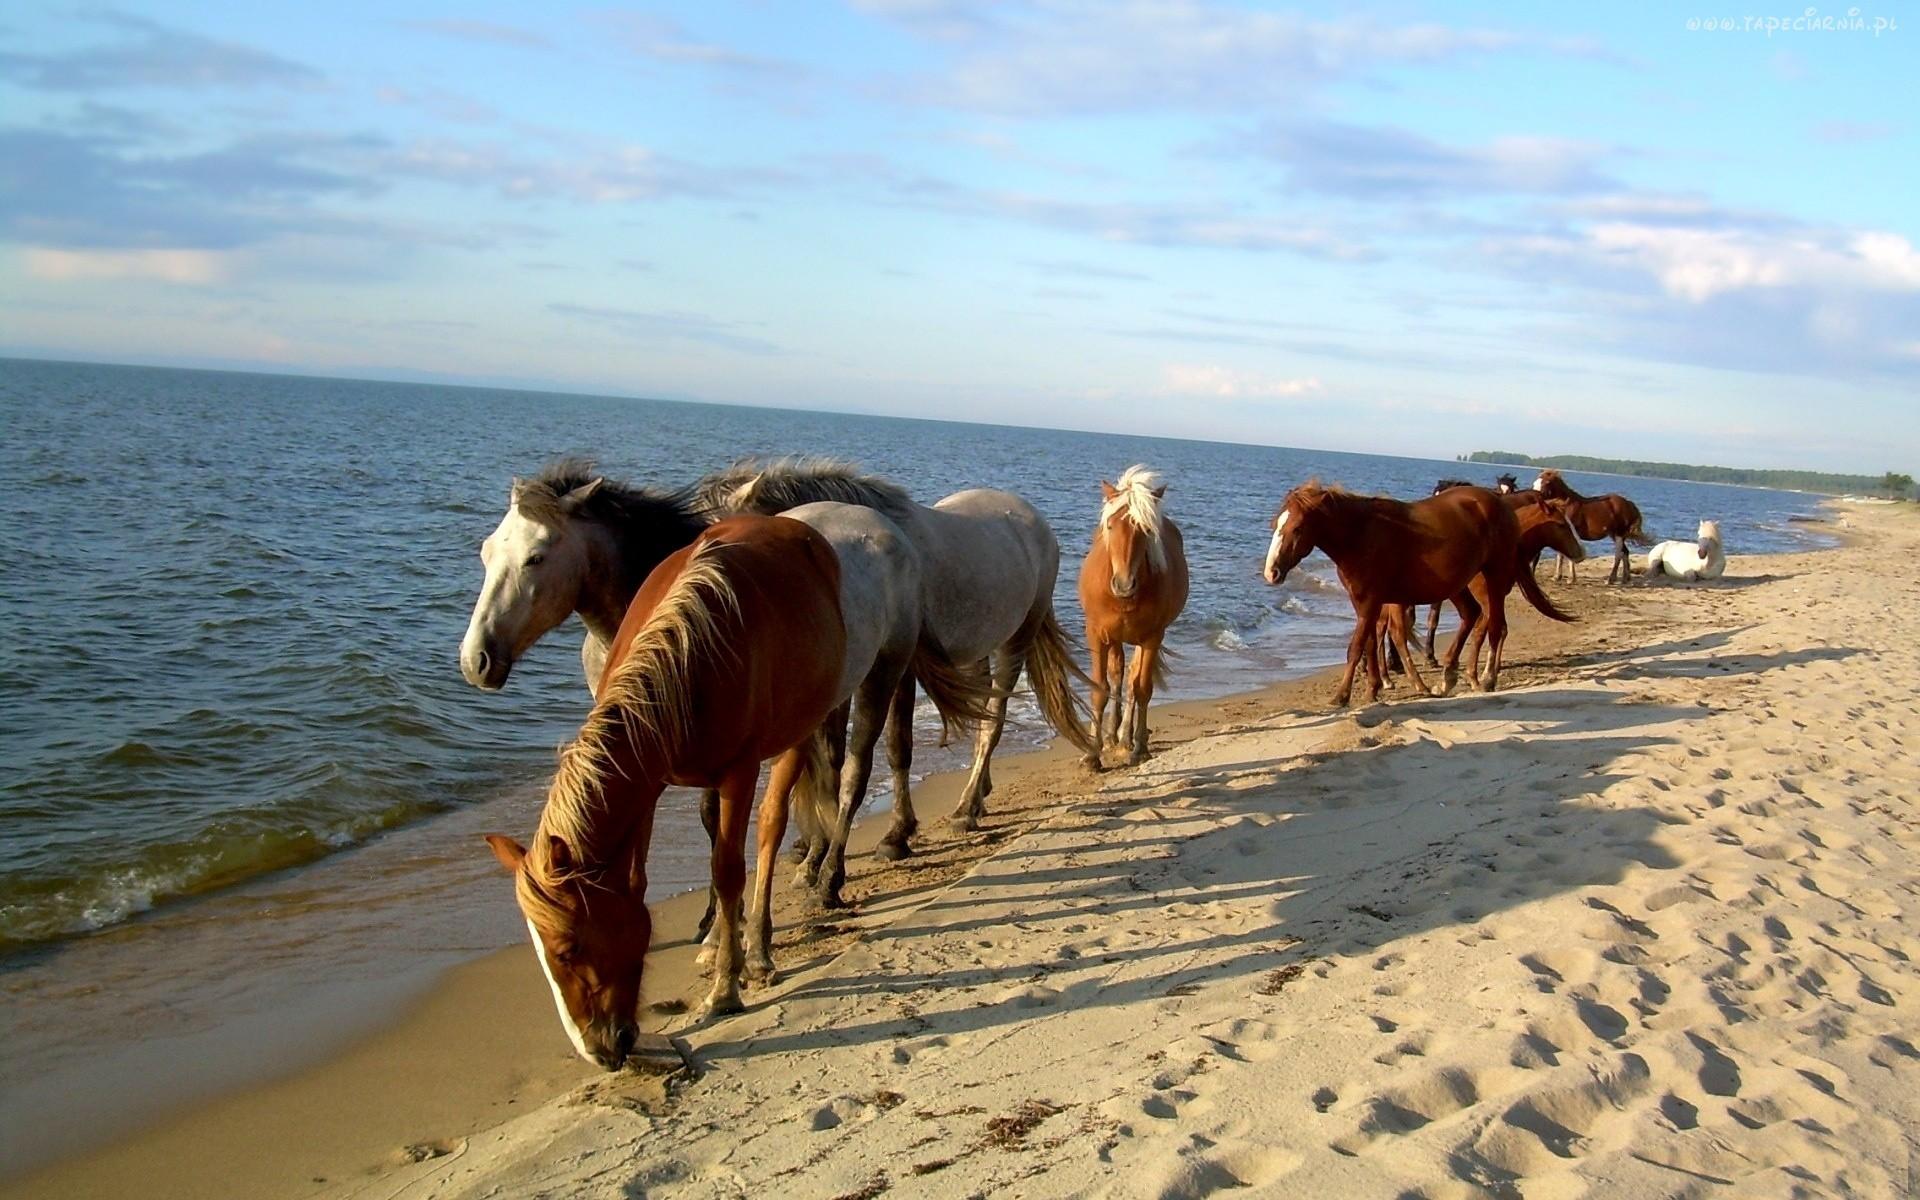 Horses on the beach wallpaper wallpapersafari for Fond ecran hd gratuit